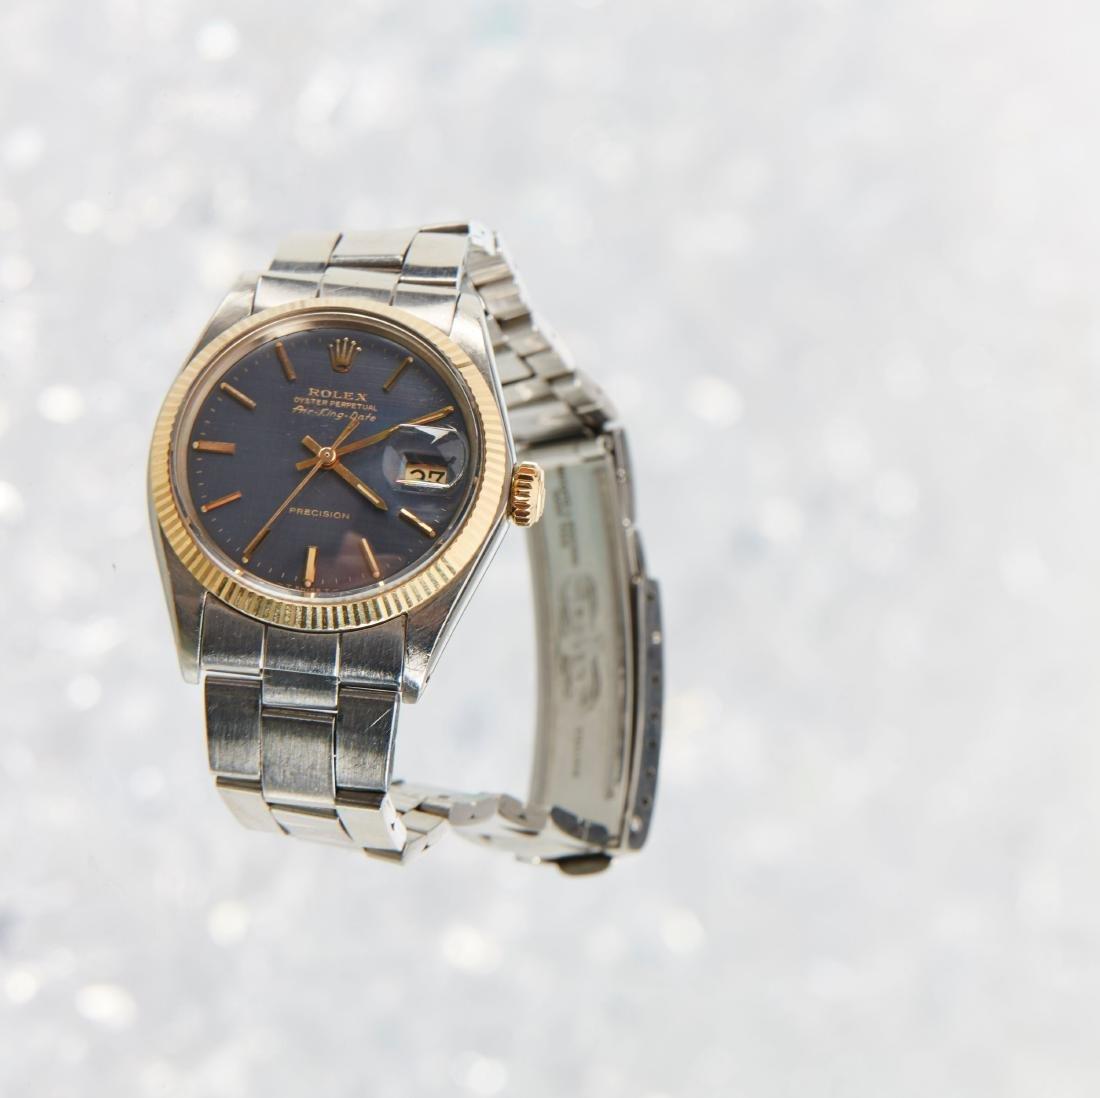 Rolex, Air King Date, Ref. 5701 - 2